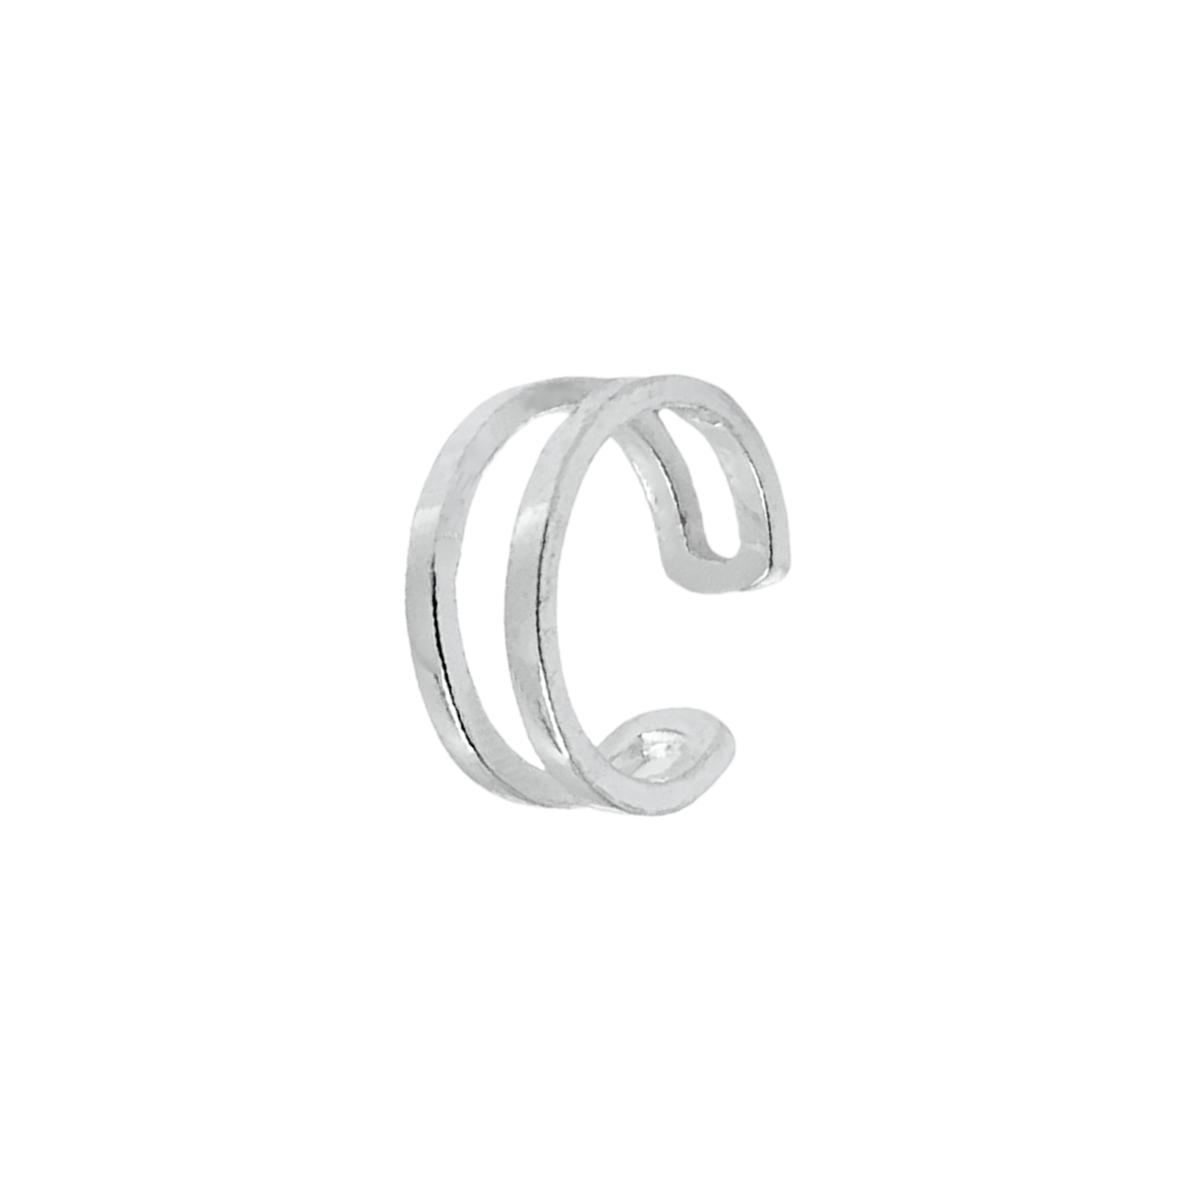 Piercing Pressão Aro Duplo Prata 925, Piercing Fake Prata